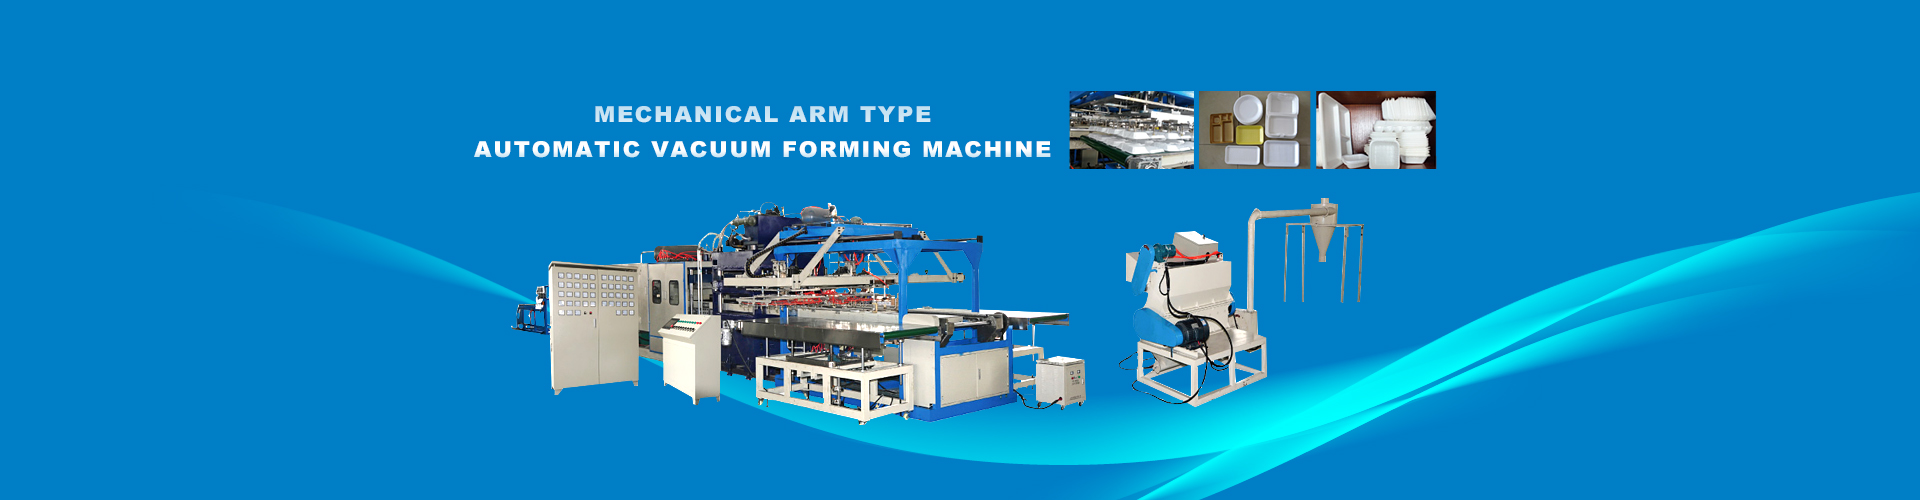 Mechanical Arm Type AutomaticVacuumForming Machine